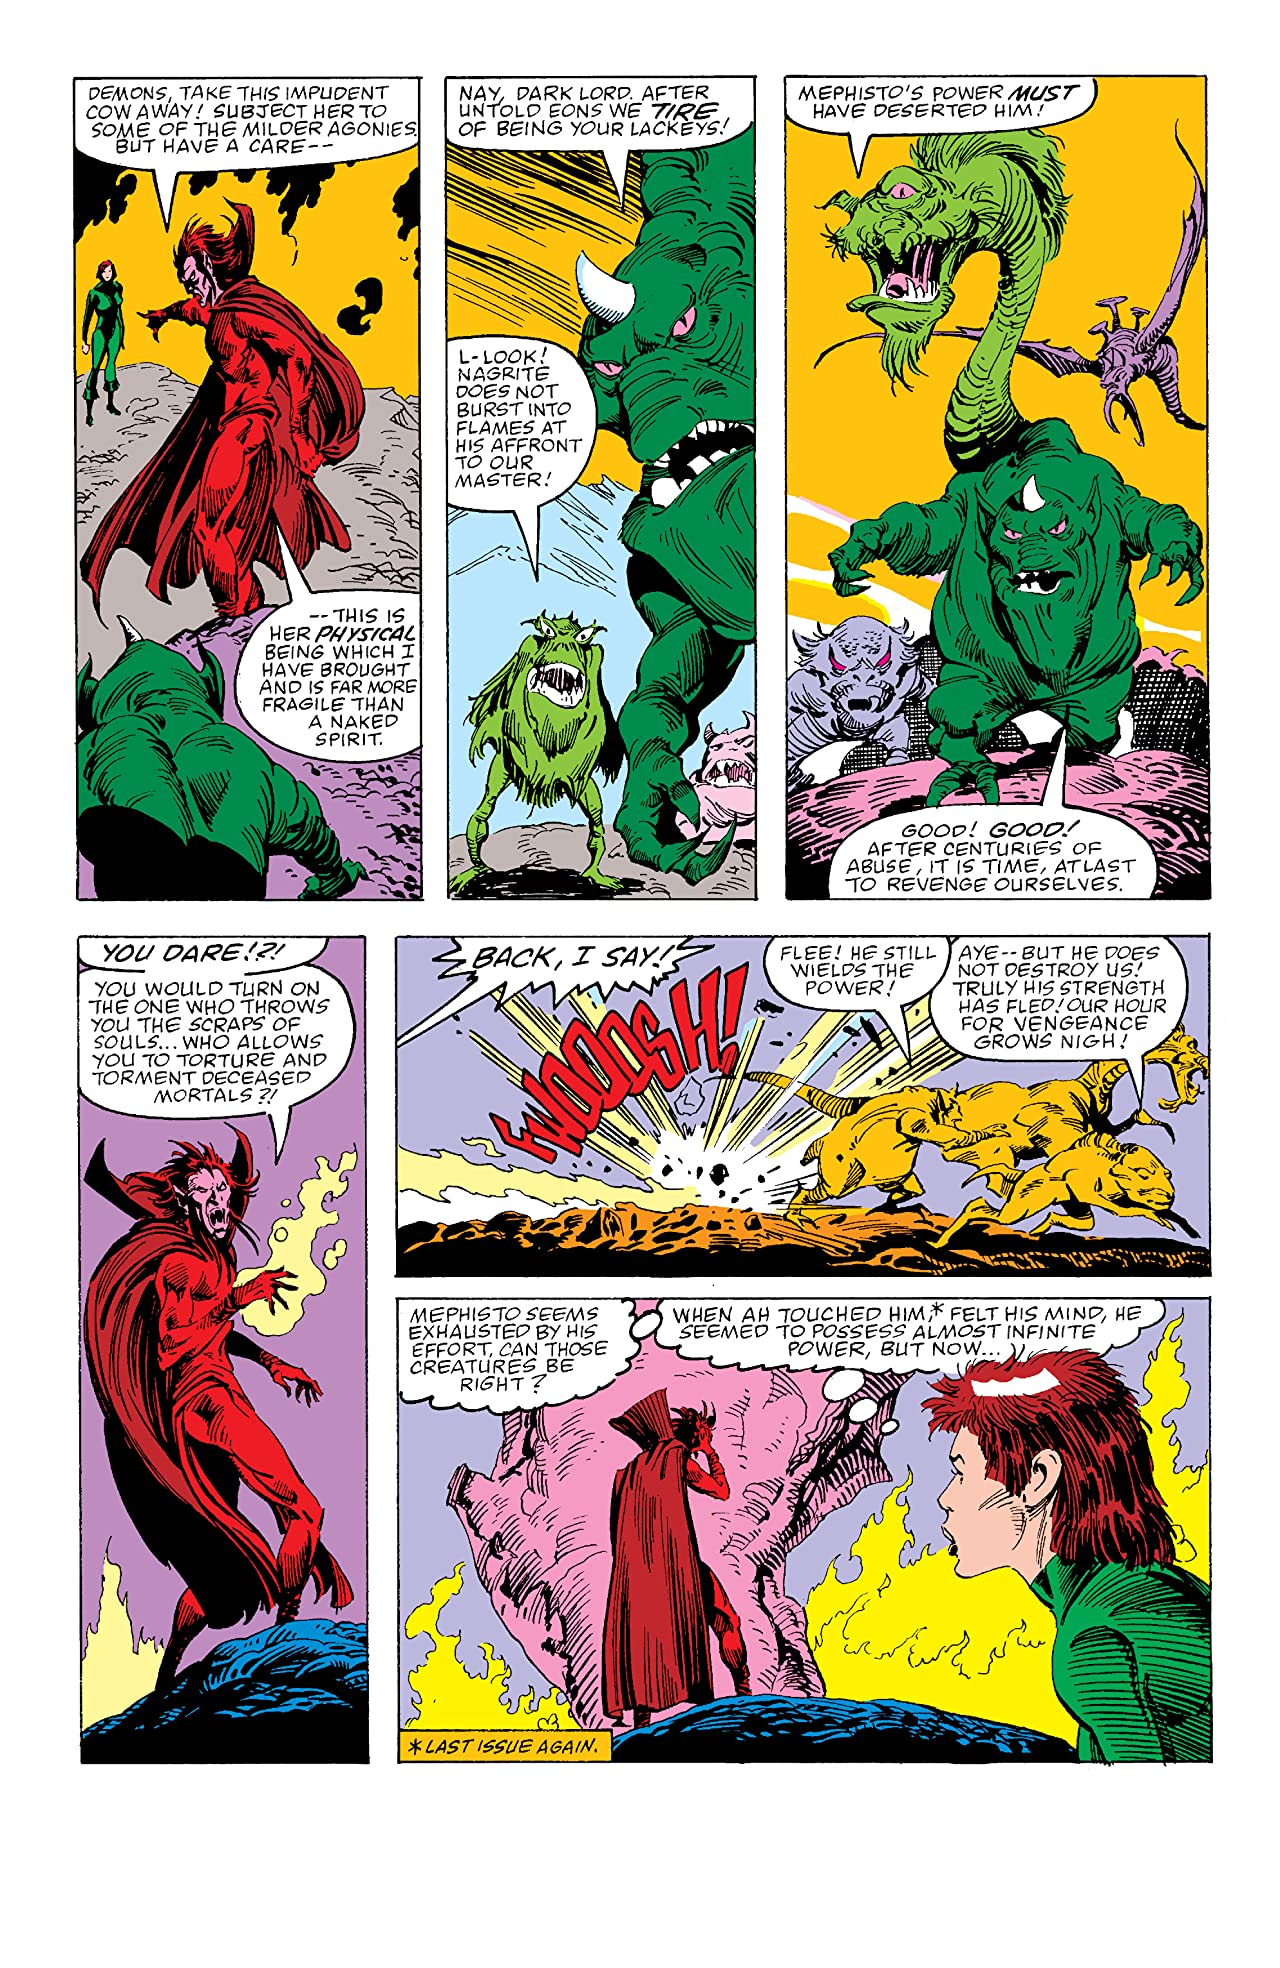 7da9b7d996 Mephisto Vs. The Avengers (1987) #4 - Comics by comiXology: Web UK